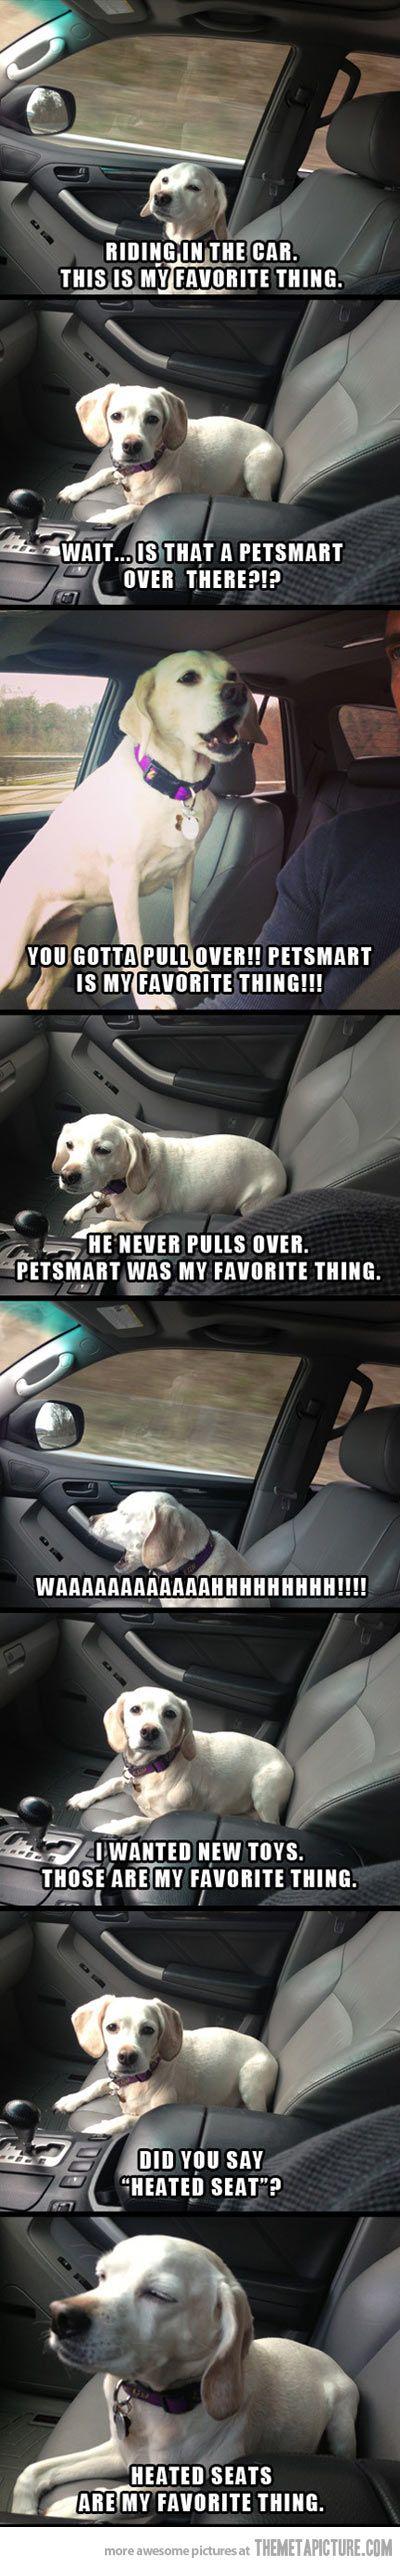 I am this dog.